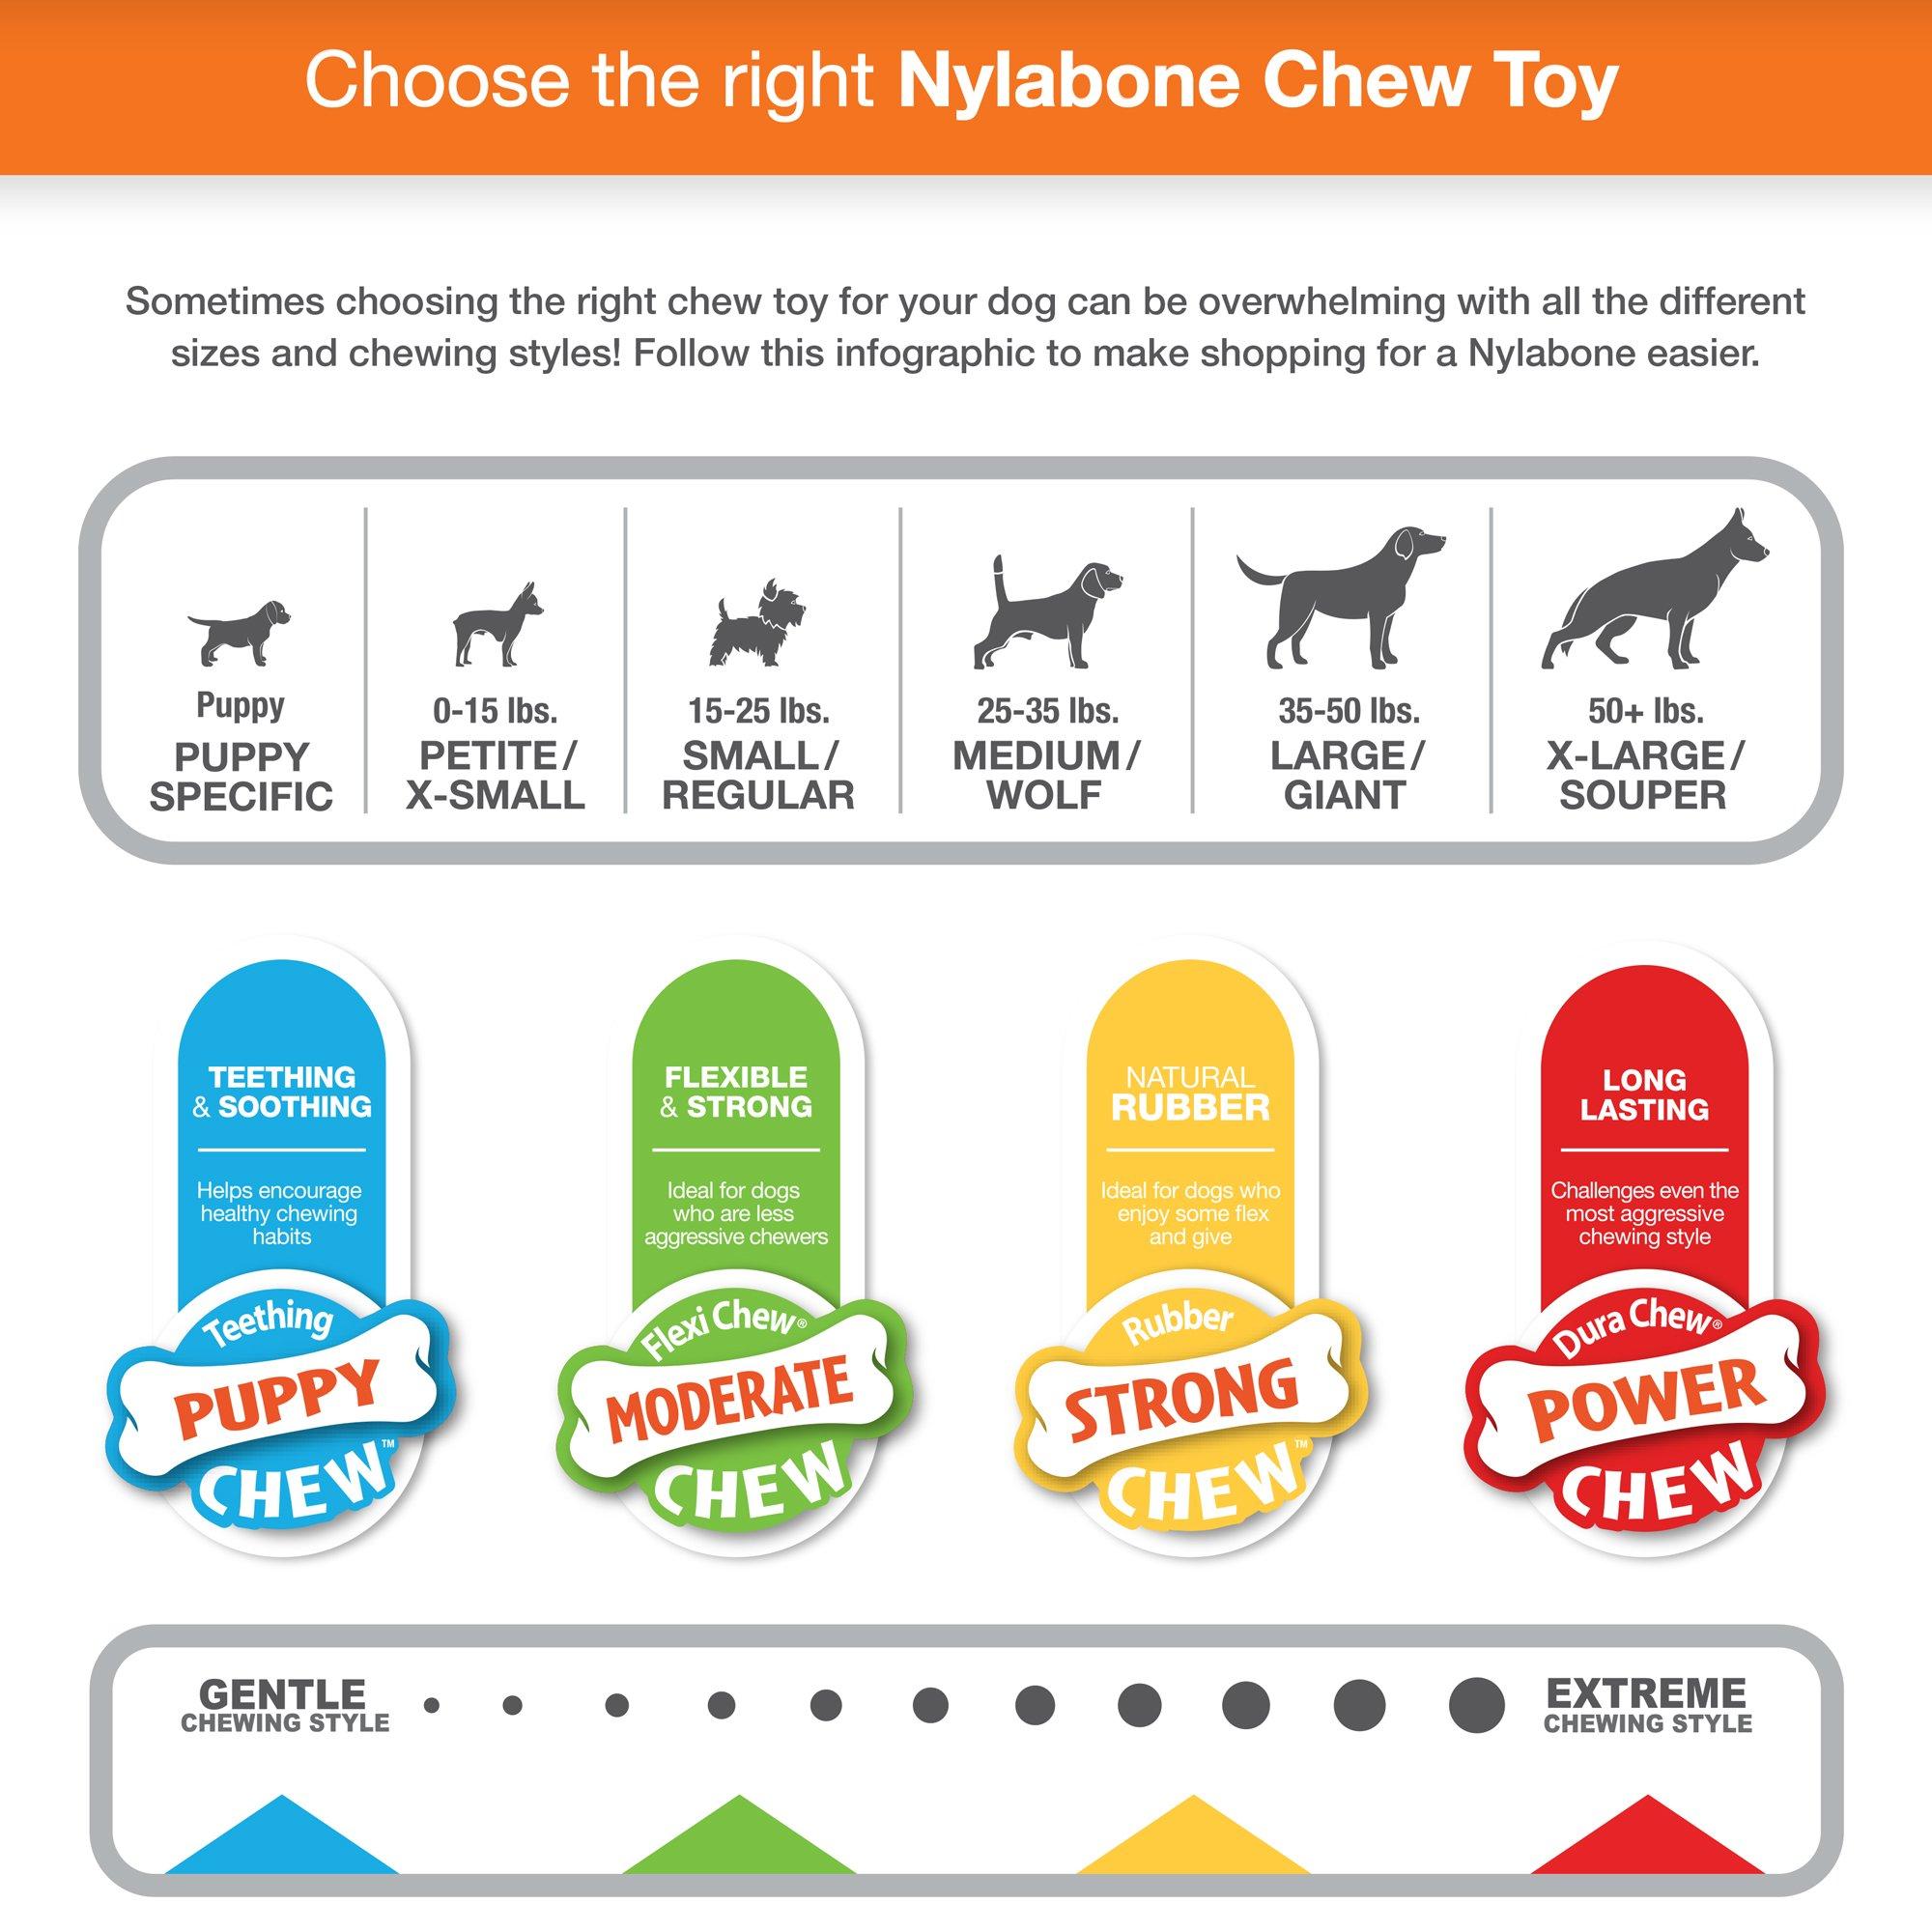 Nylabone NRP002VPP Puppy Chew Variety Toy & Treat Triple Pack Chicken & Lamb & Apple Regular 3 Count, Pink